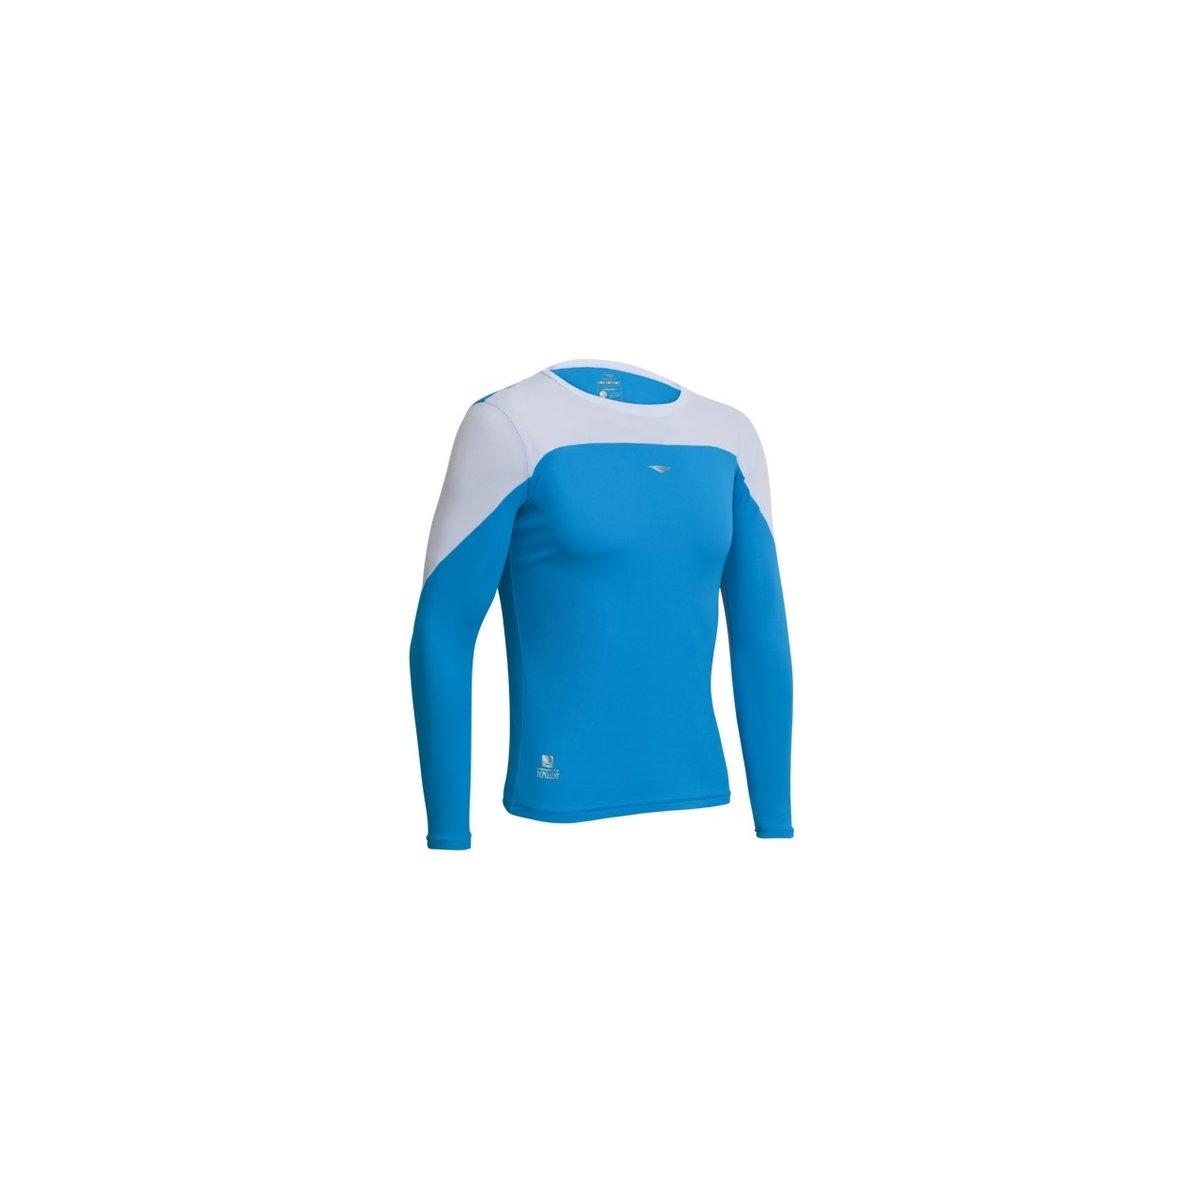 Repelente Ml Penalty Camisa Camisa e Branco Repelente Ml Vii Azul Vii Masc Penalty Masc Azul XASWR